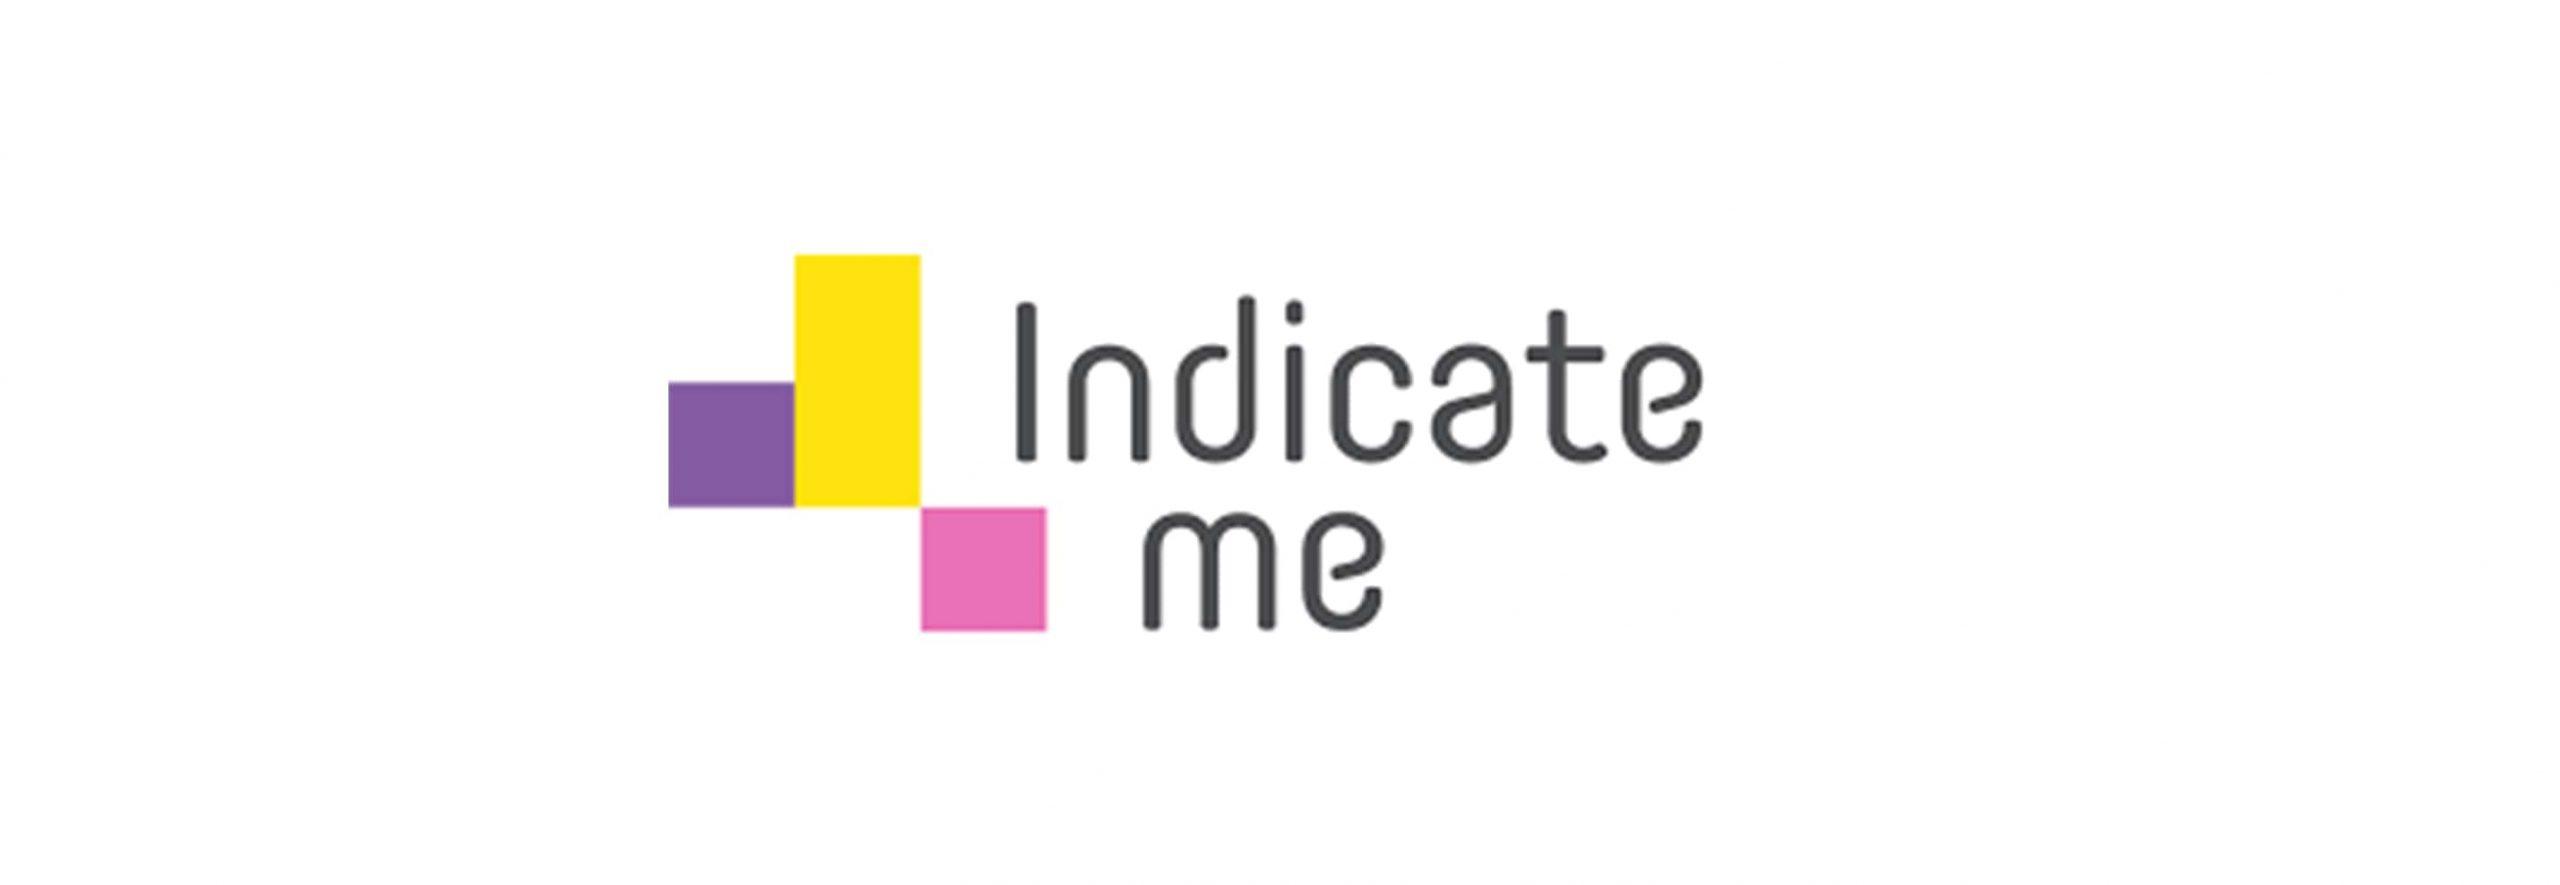 indicate me-min